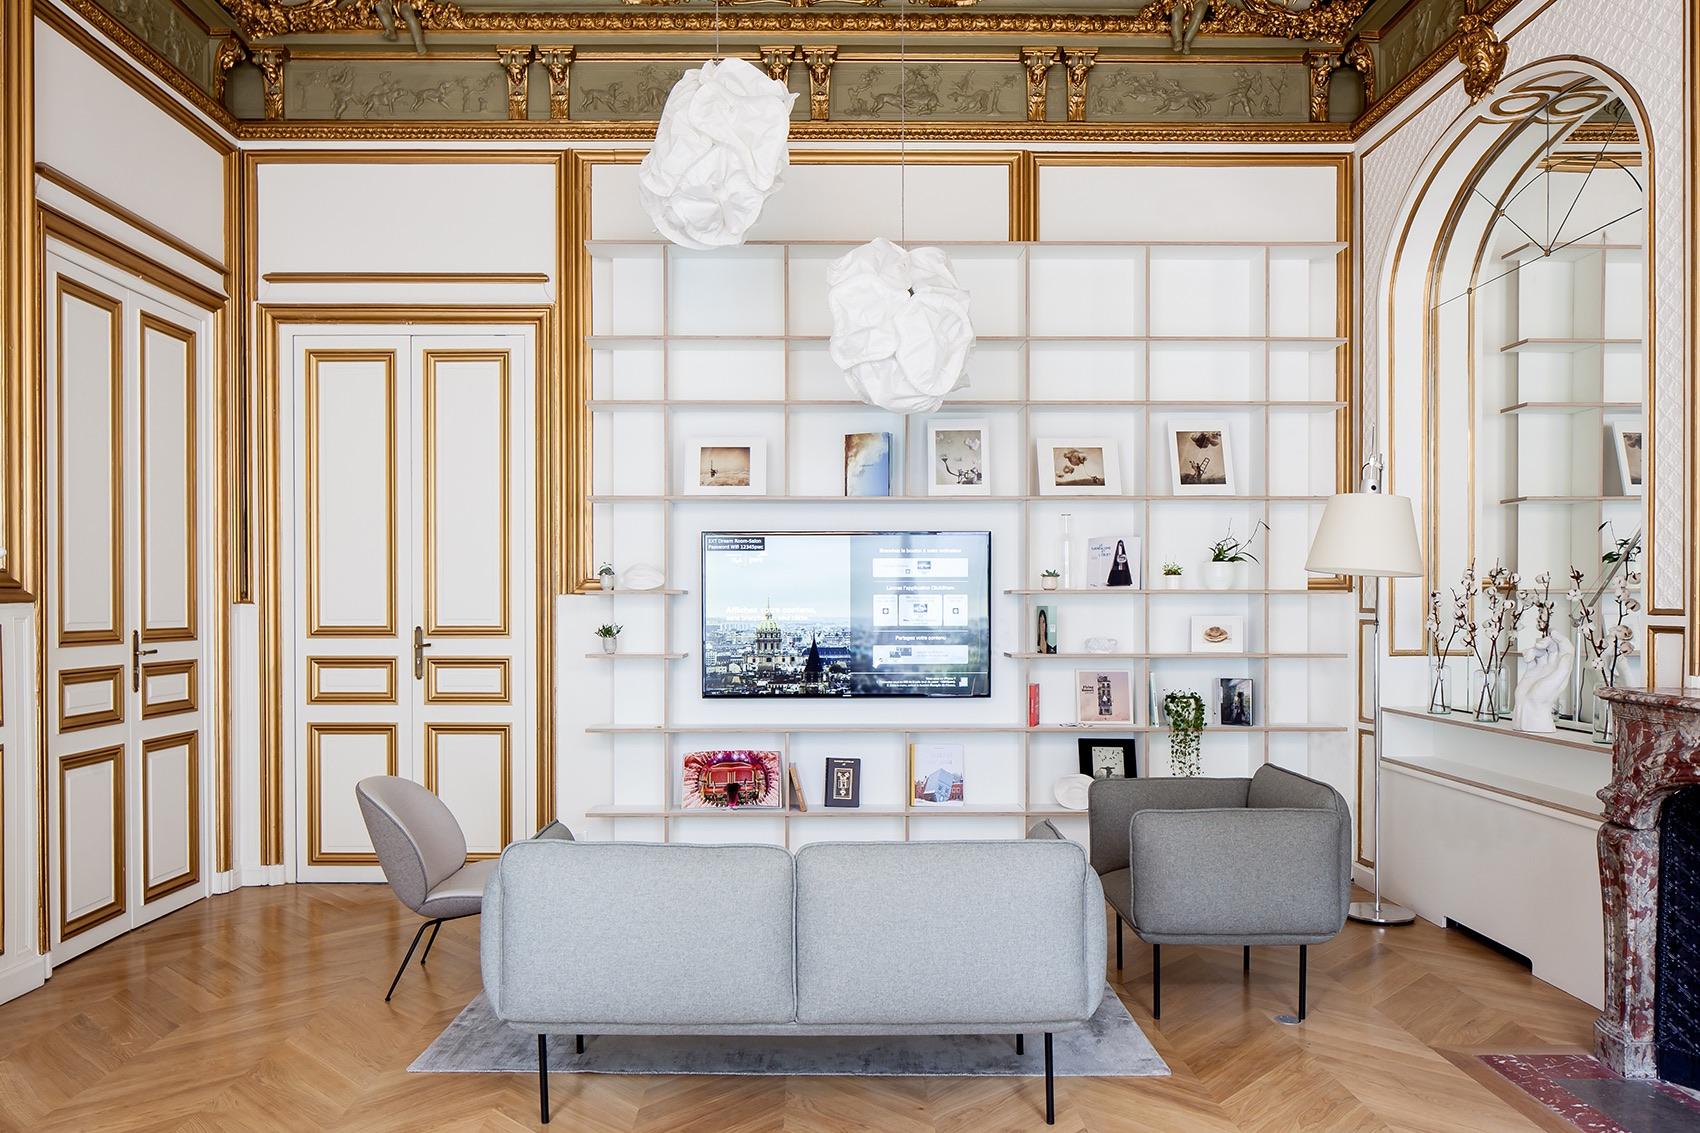 pwc-paris-office-22